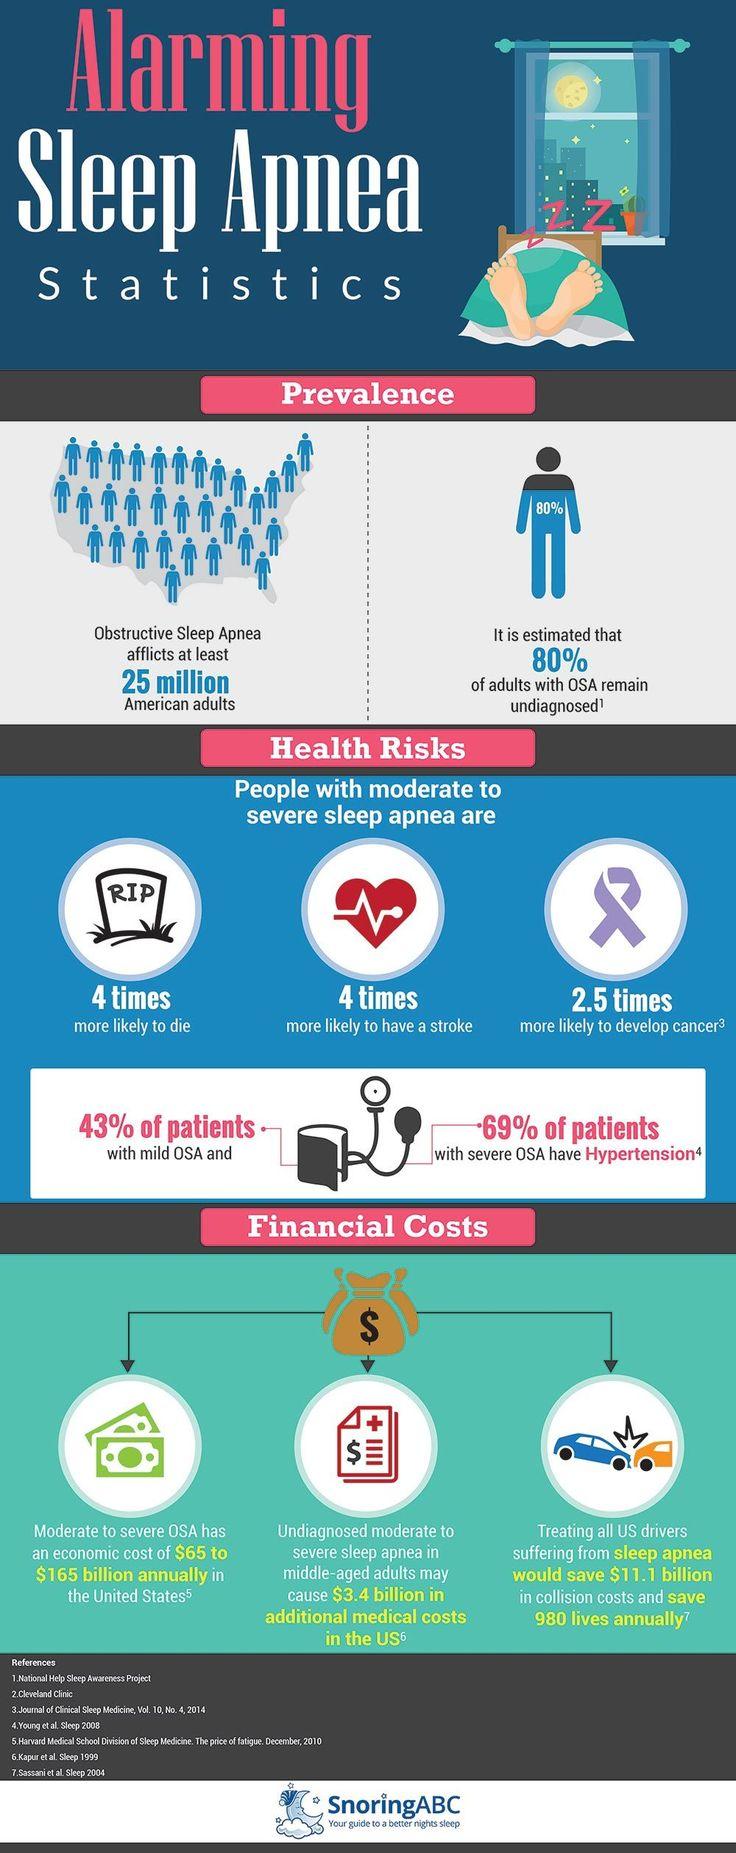 Sleep Apnea Facts & Statistics